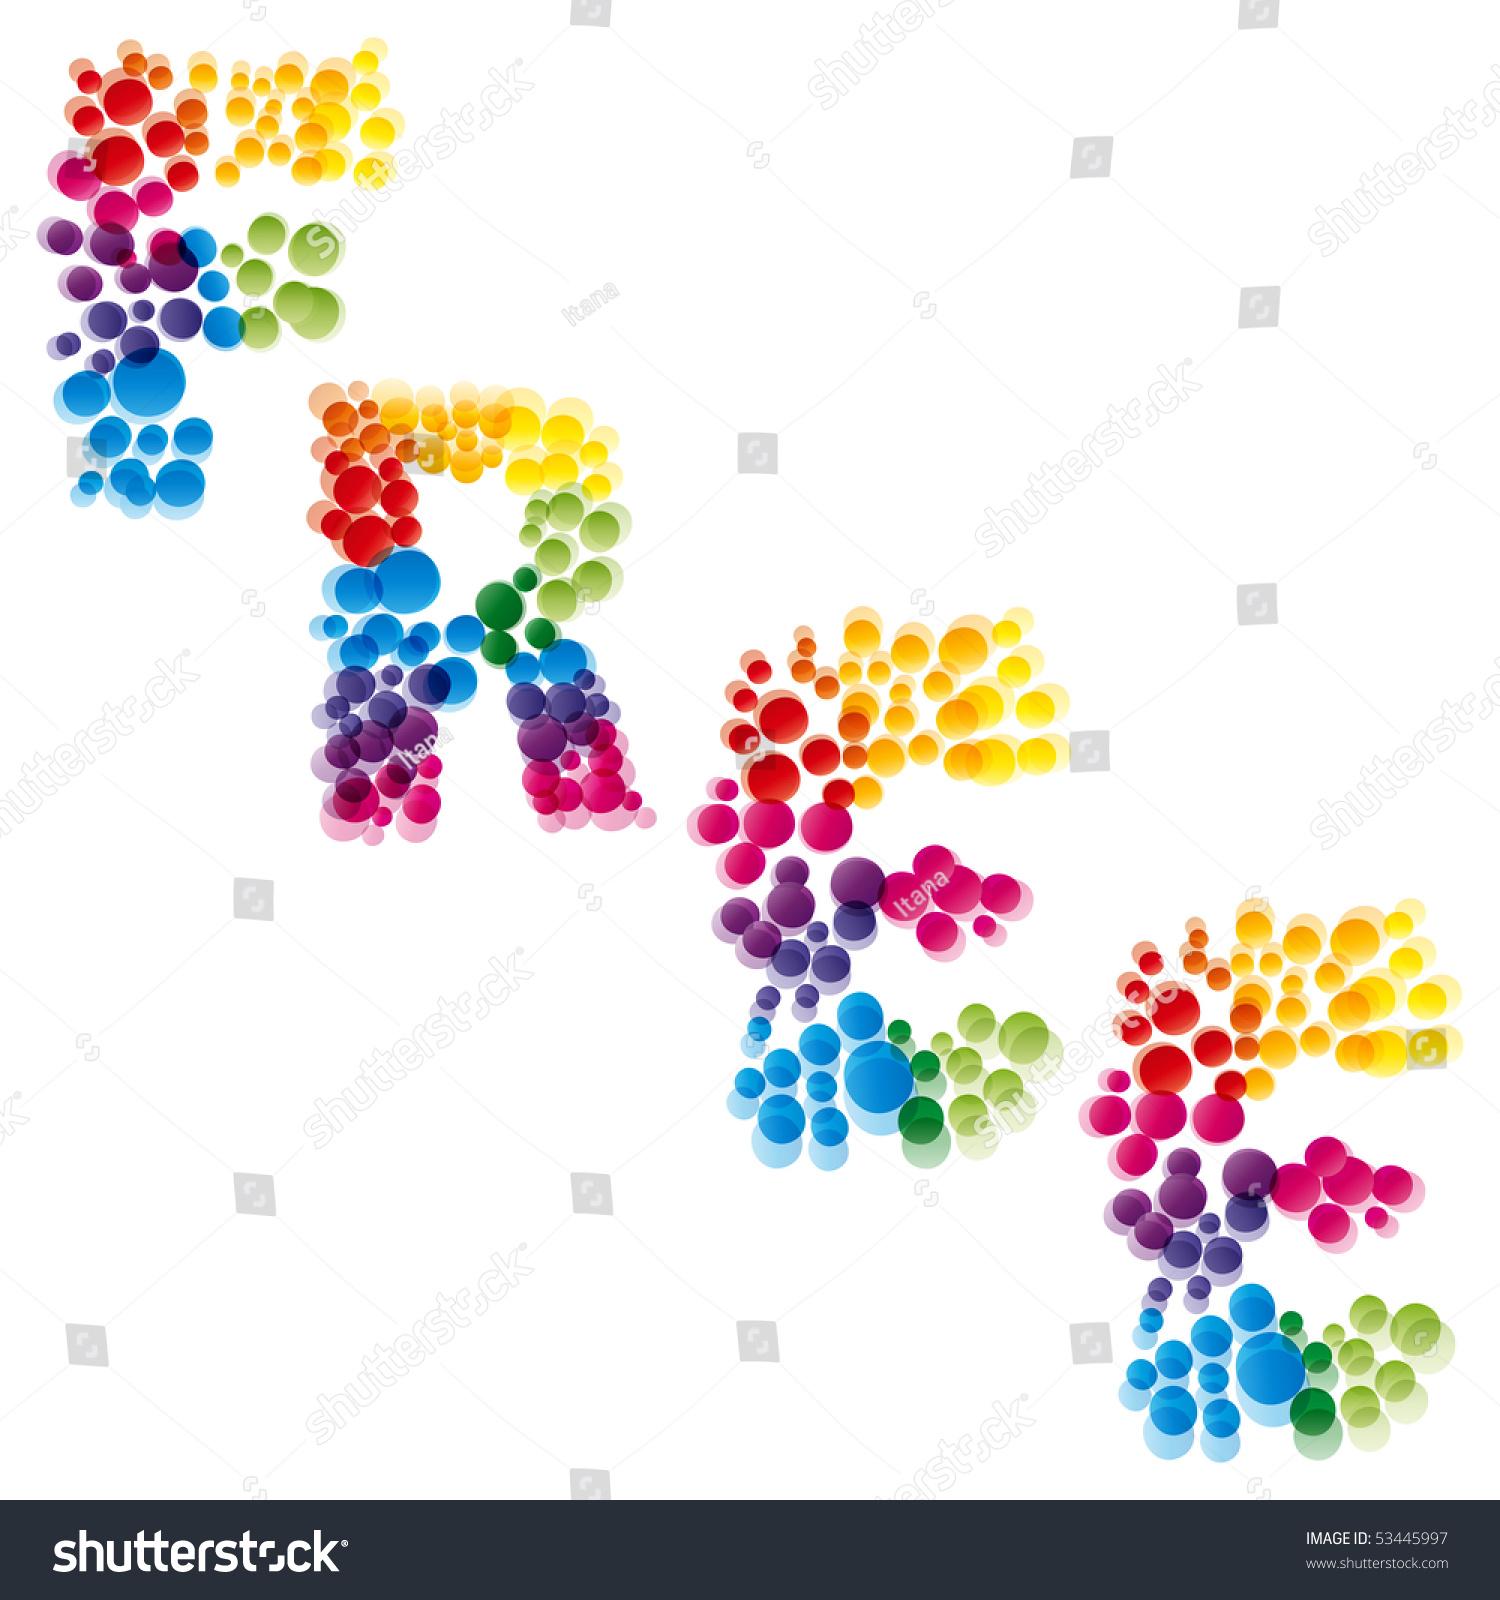 free rainbow font stock illustration 53445997 shutterstock